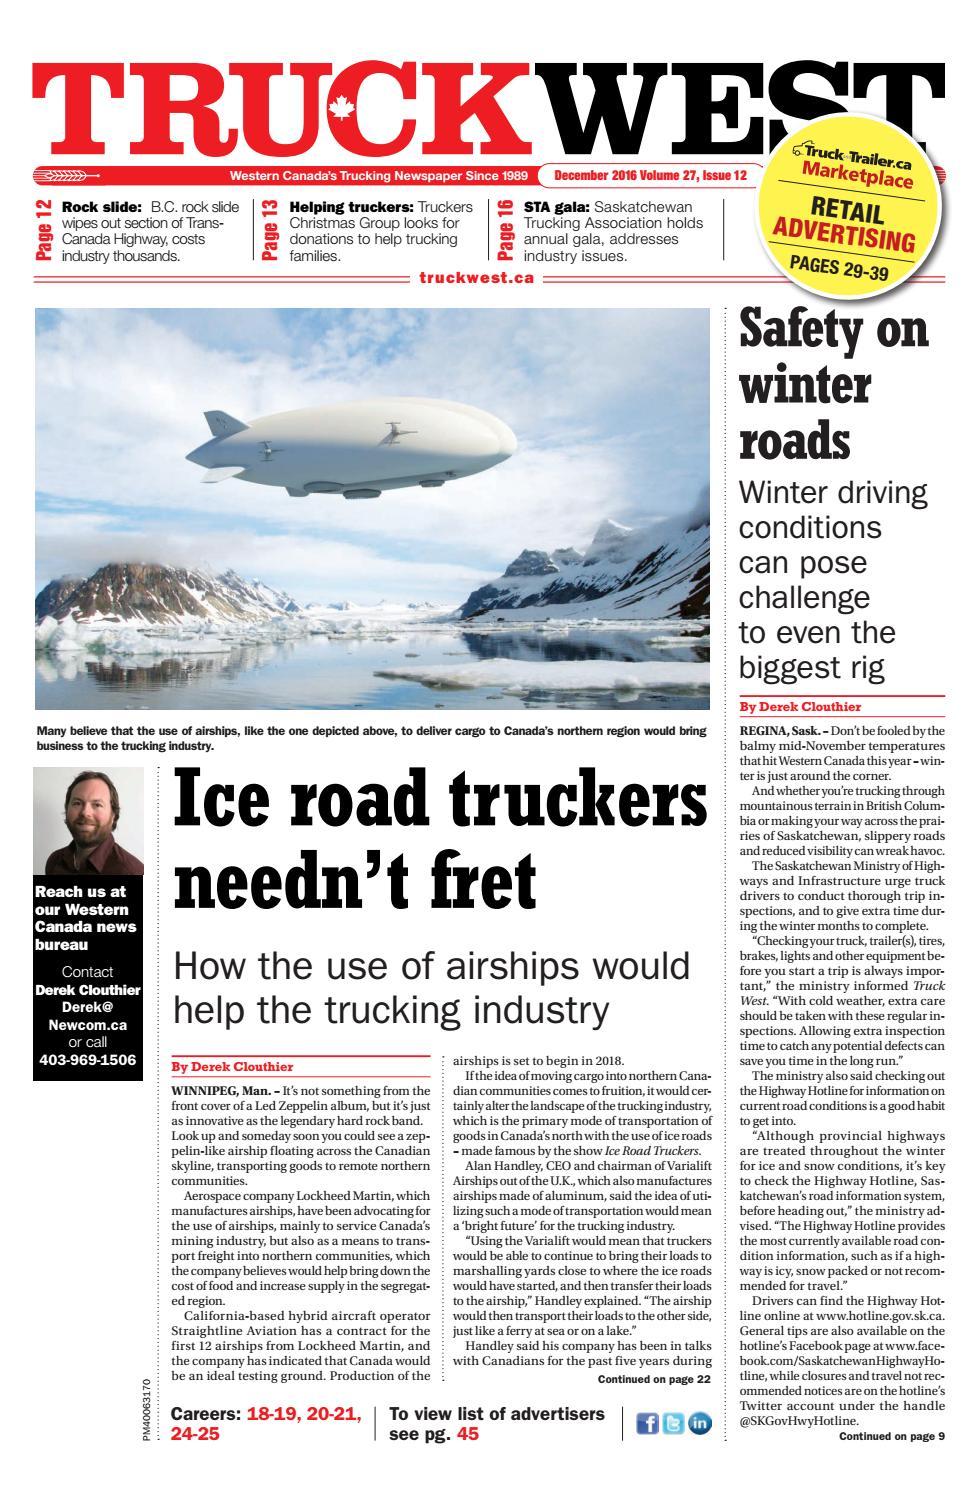 Truck West December 2016 by Annex Business Media - issuu